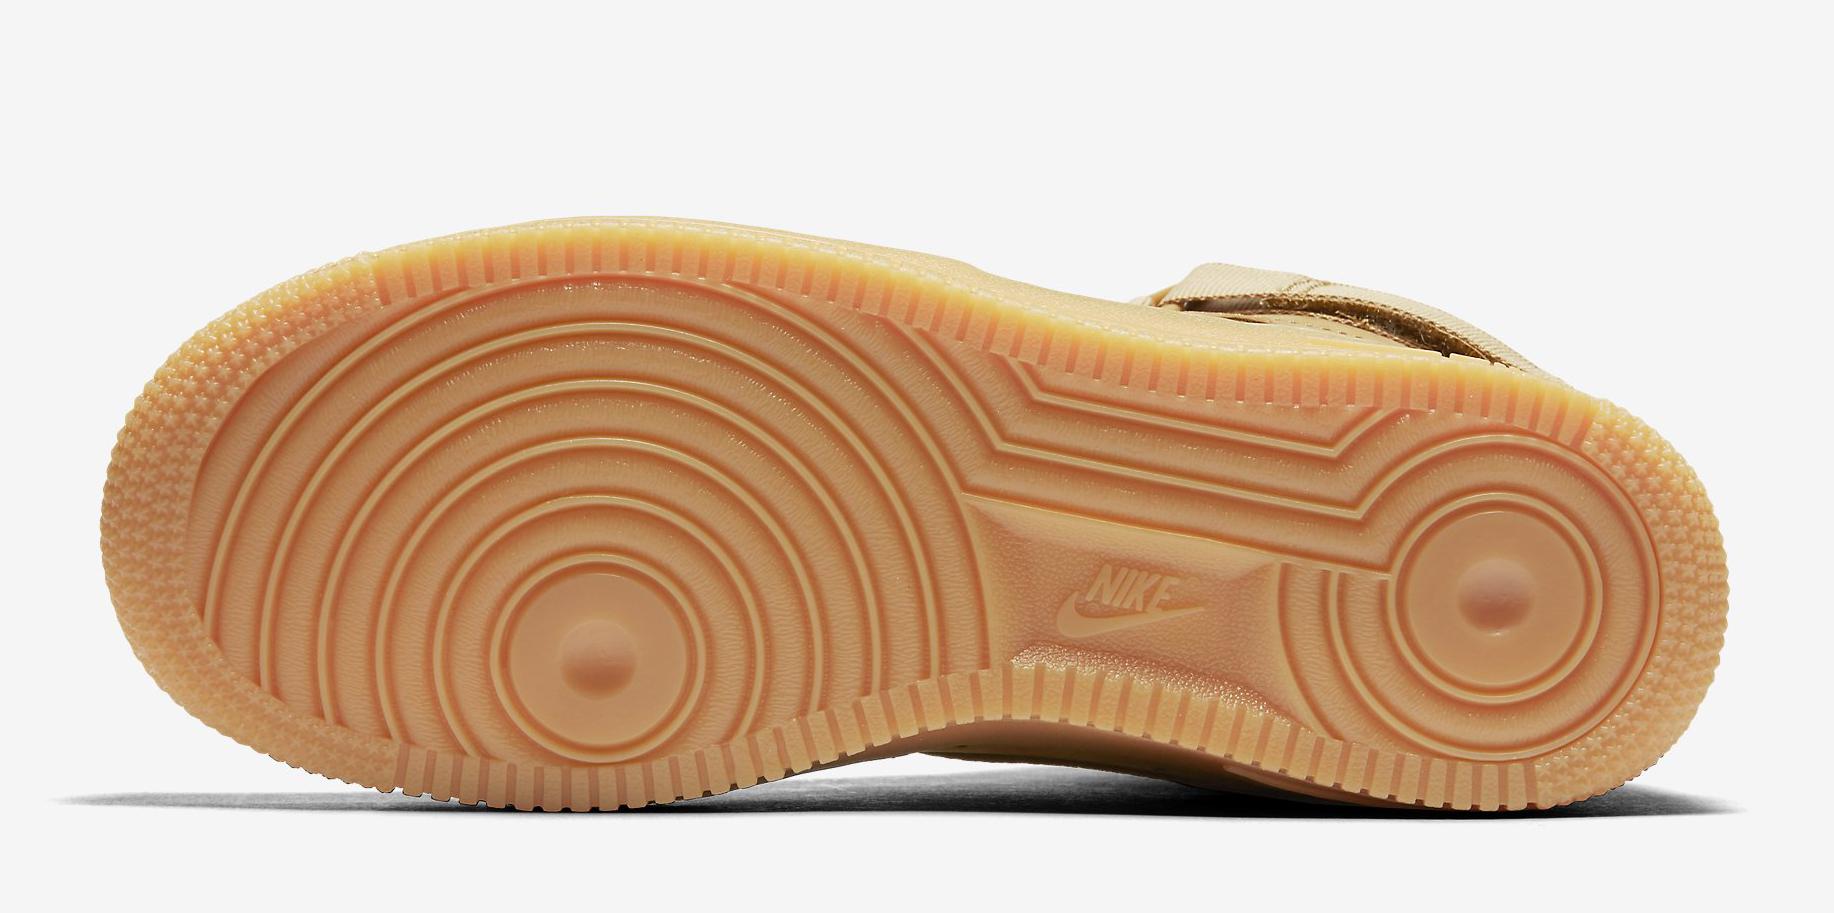 Wheat Nike Air Force 1 654440-200 Sole